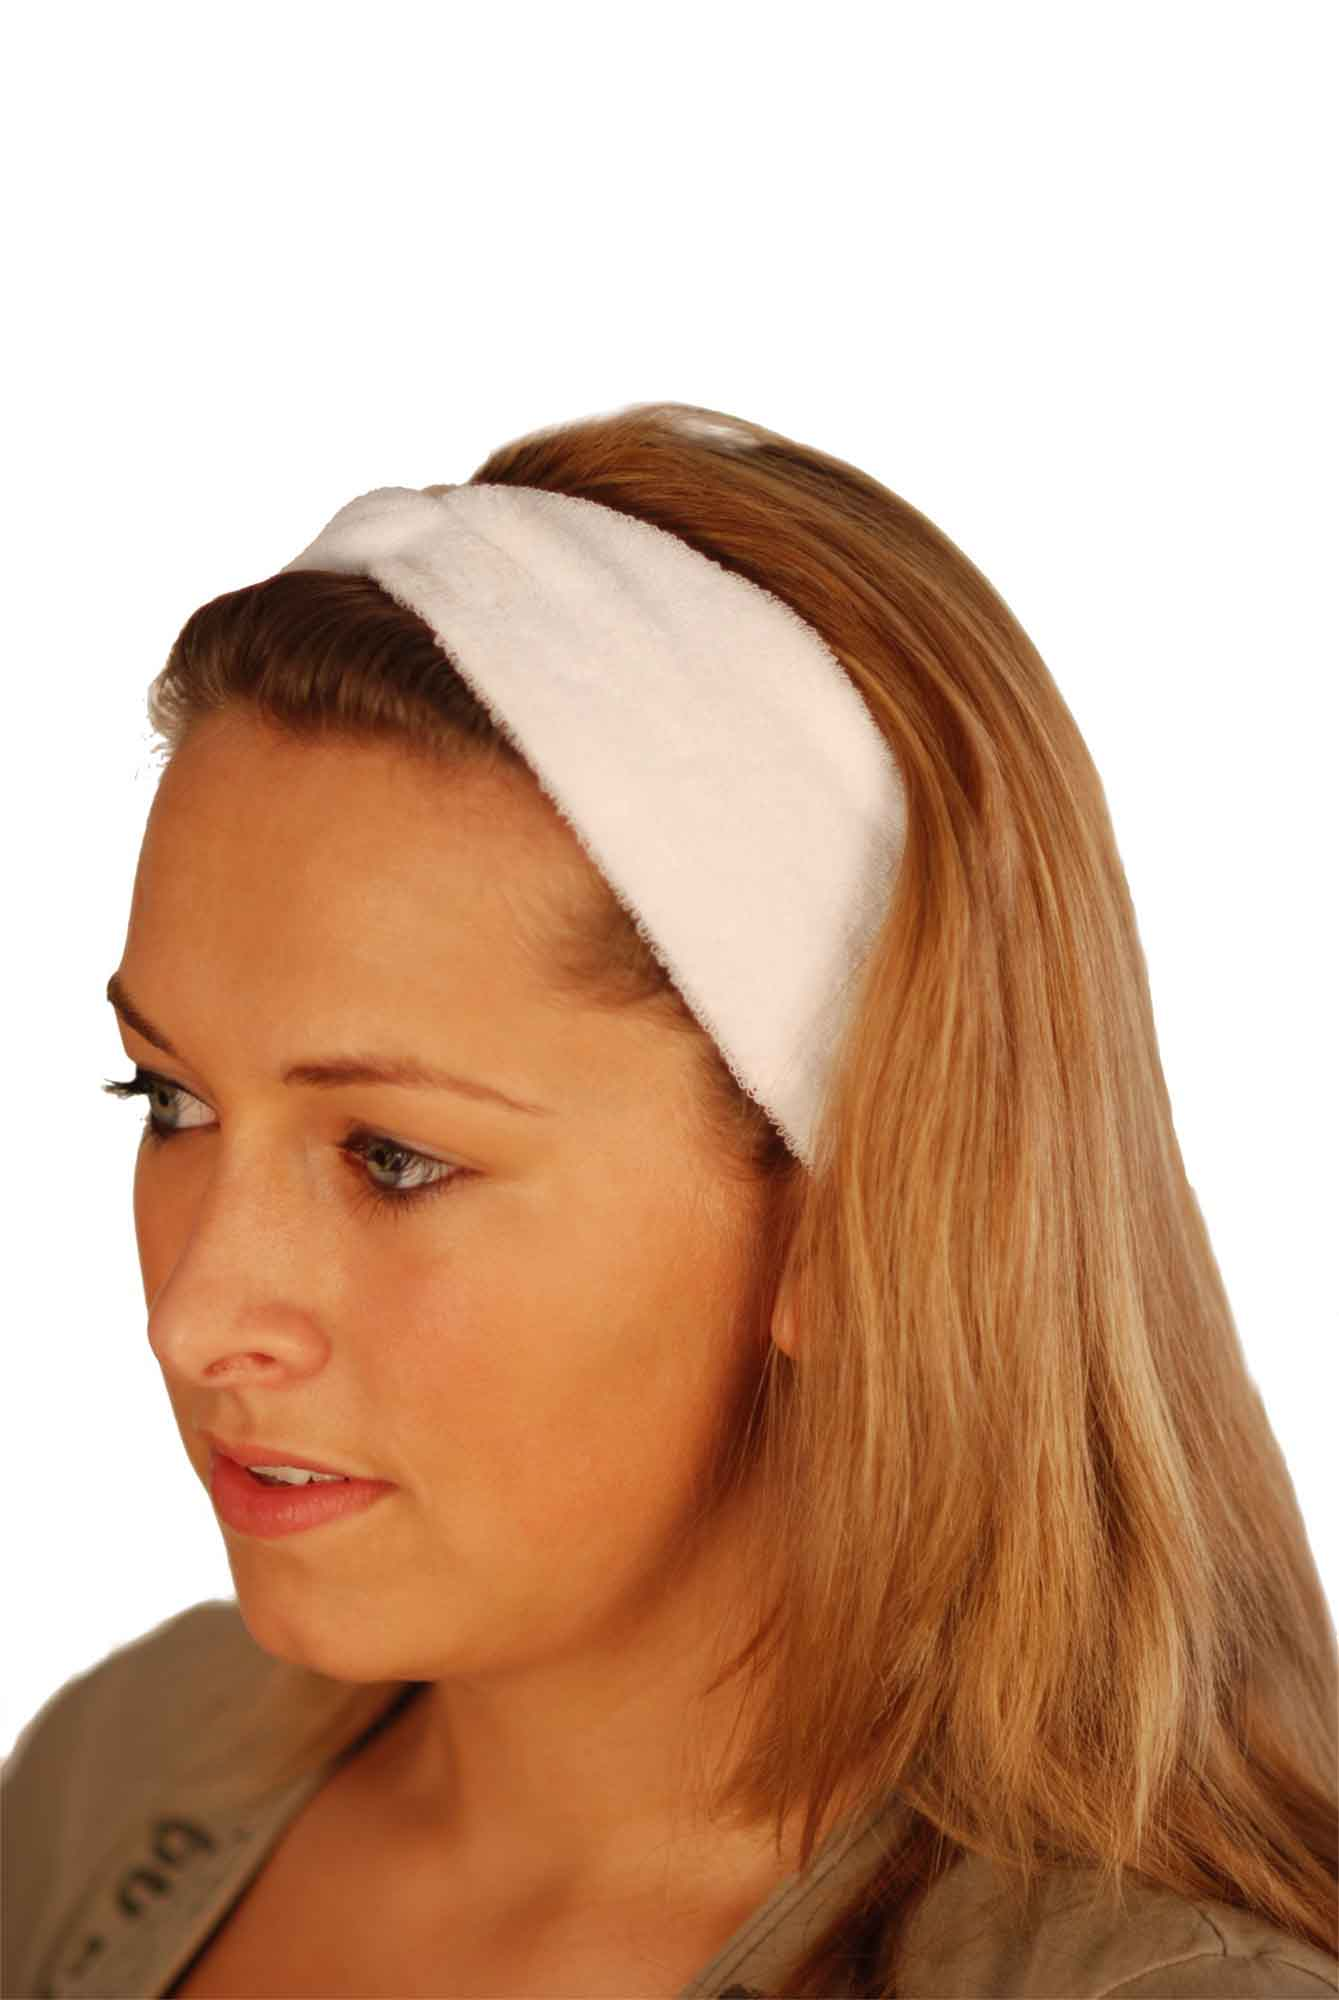 Fantasia Beauty-Accessoires Kosmetik-Haarband aus Baumwoll-Stretch 1 Stck. 686010